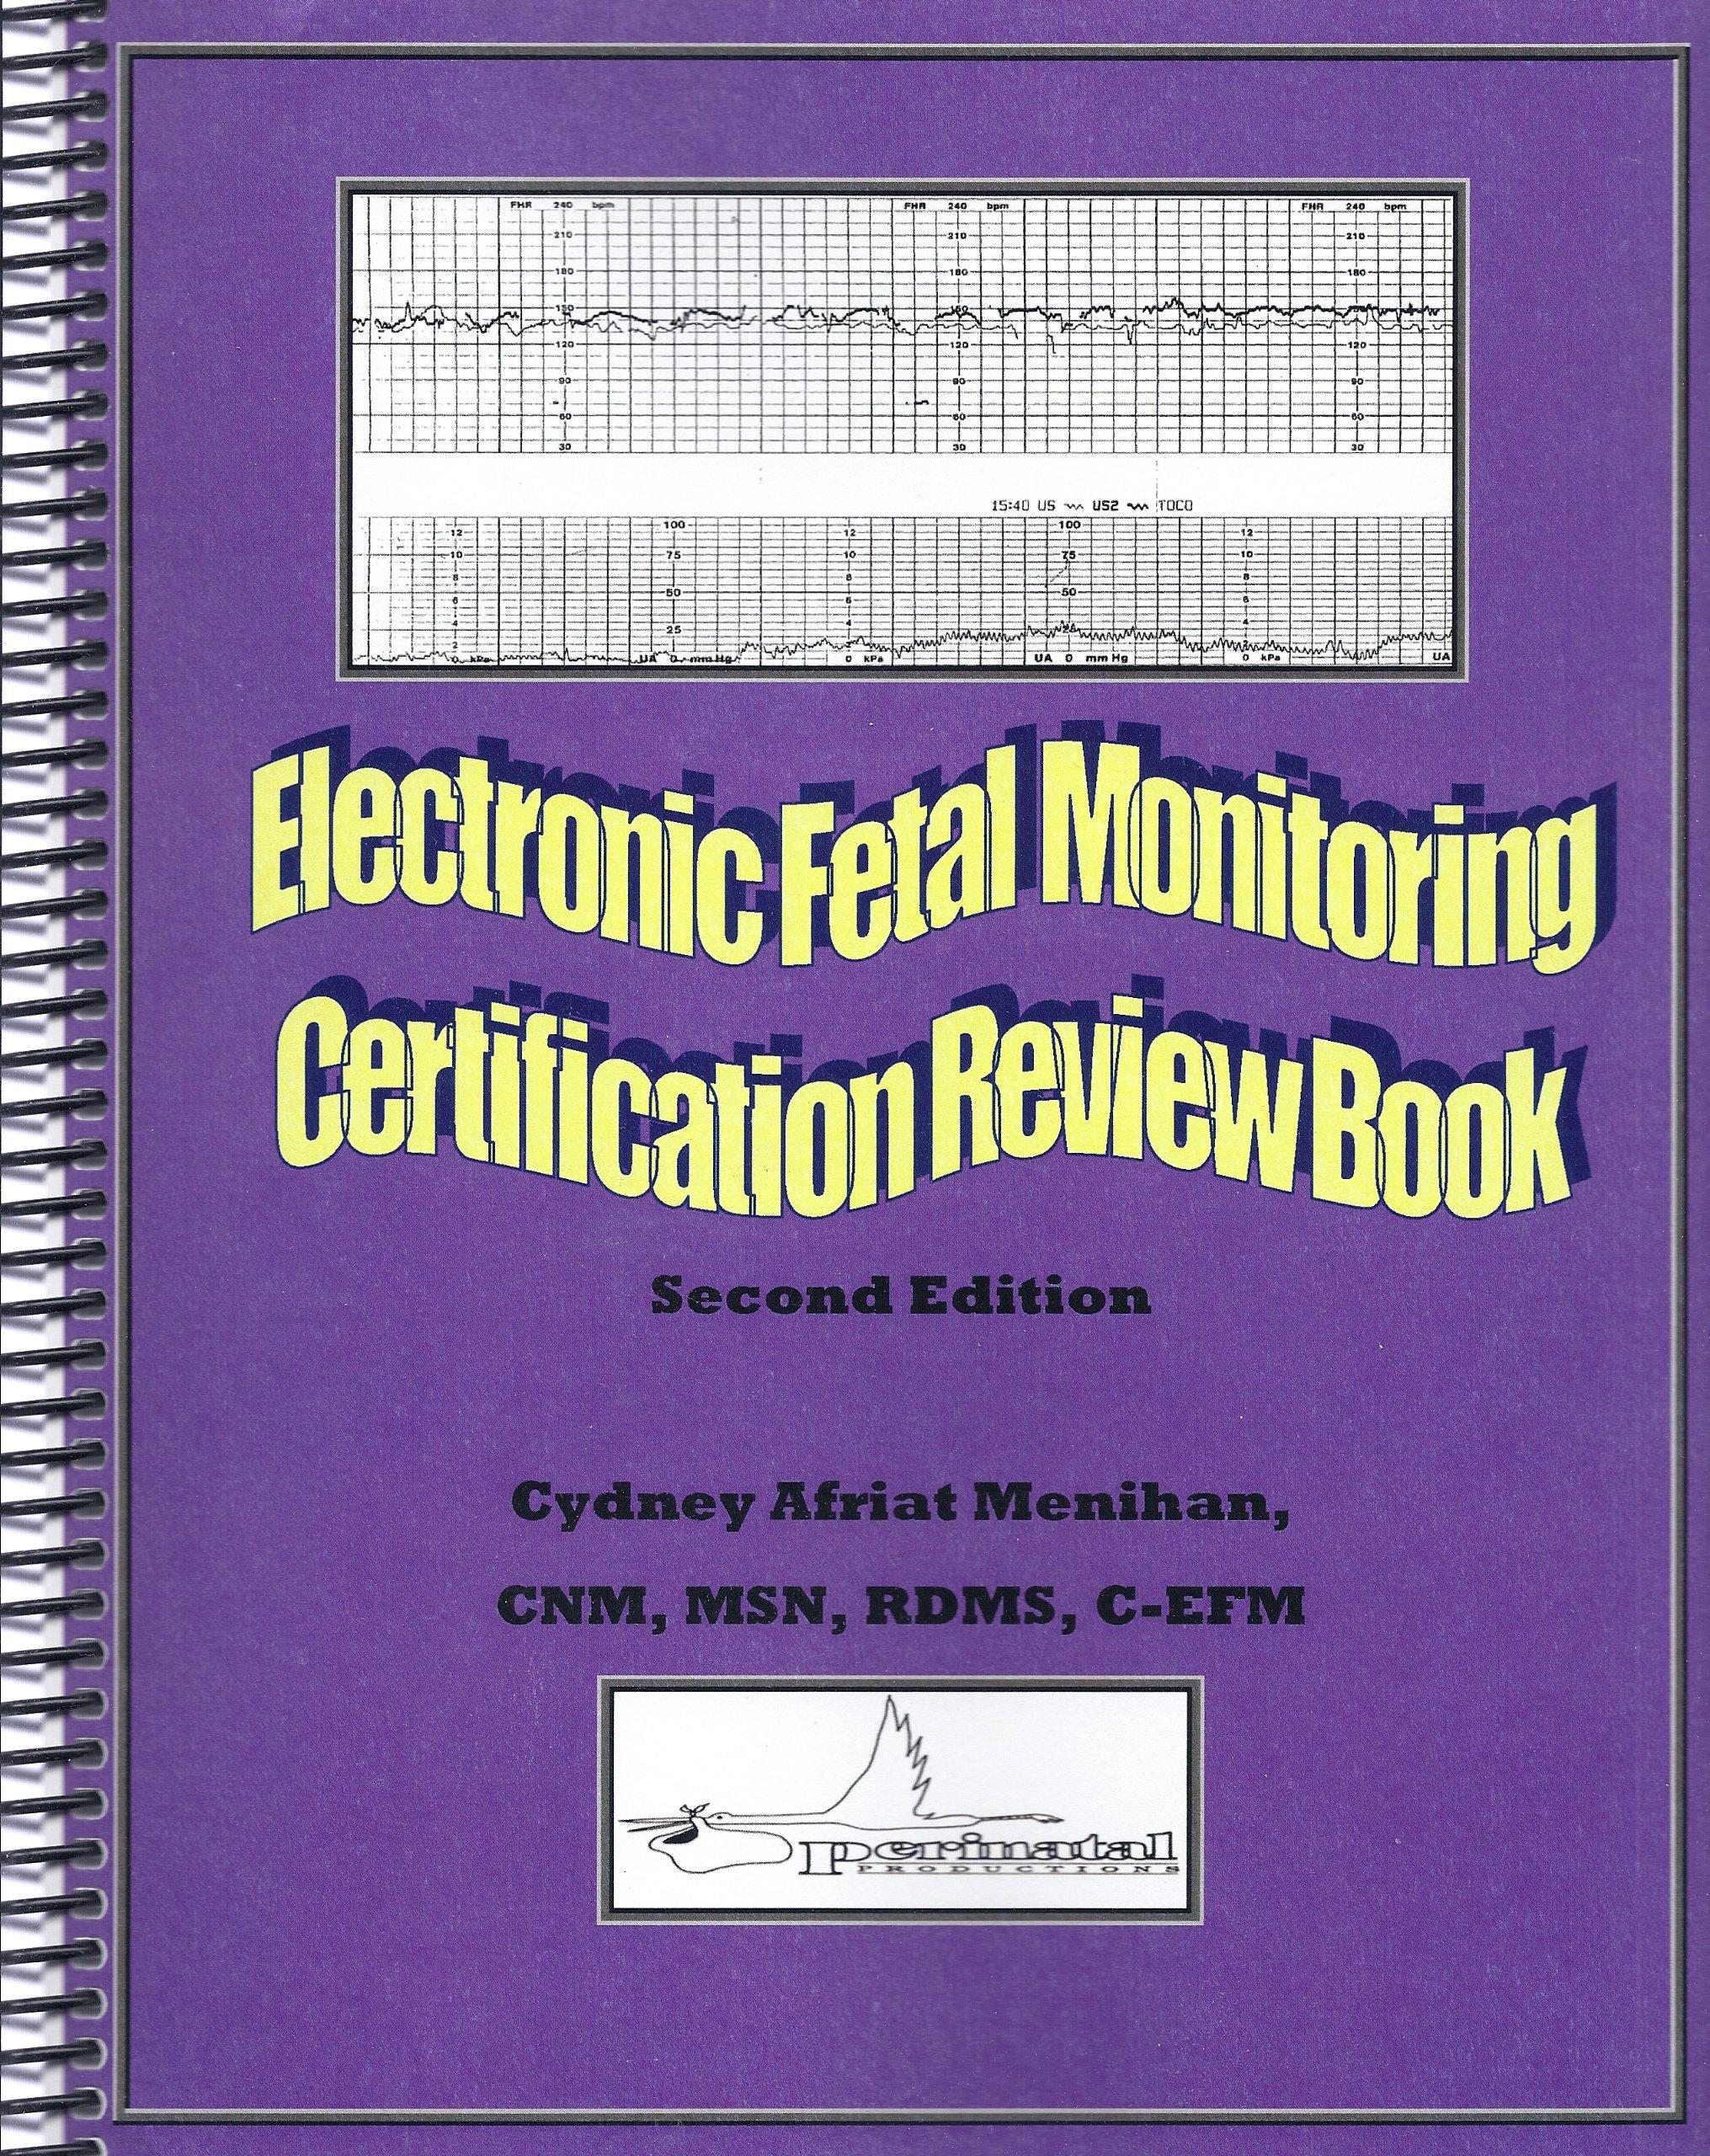 Electronic fetal monitoring efm certification review book 2nd electronic fetal monitoring efm certification review book 2nd edition cnm msn rdms c efm cydney afriat menihan 9780982454855 amazon books fandeluxe Choice Image